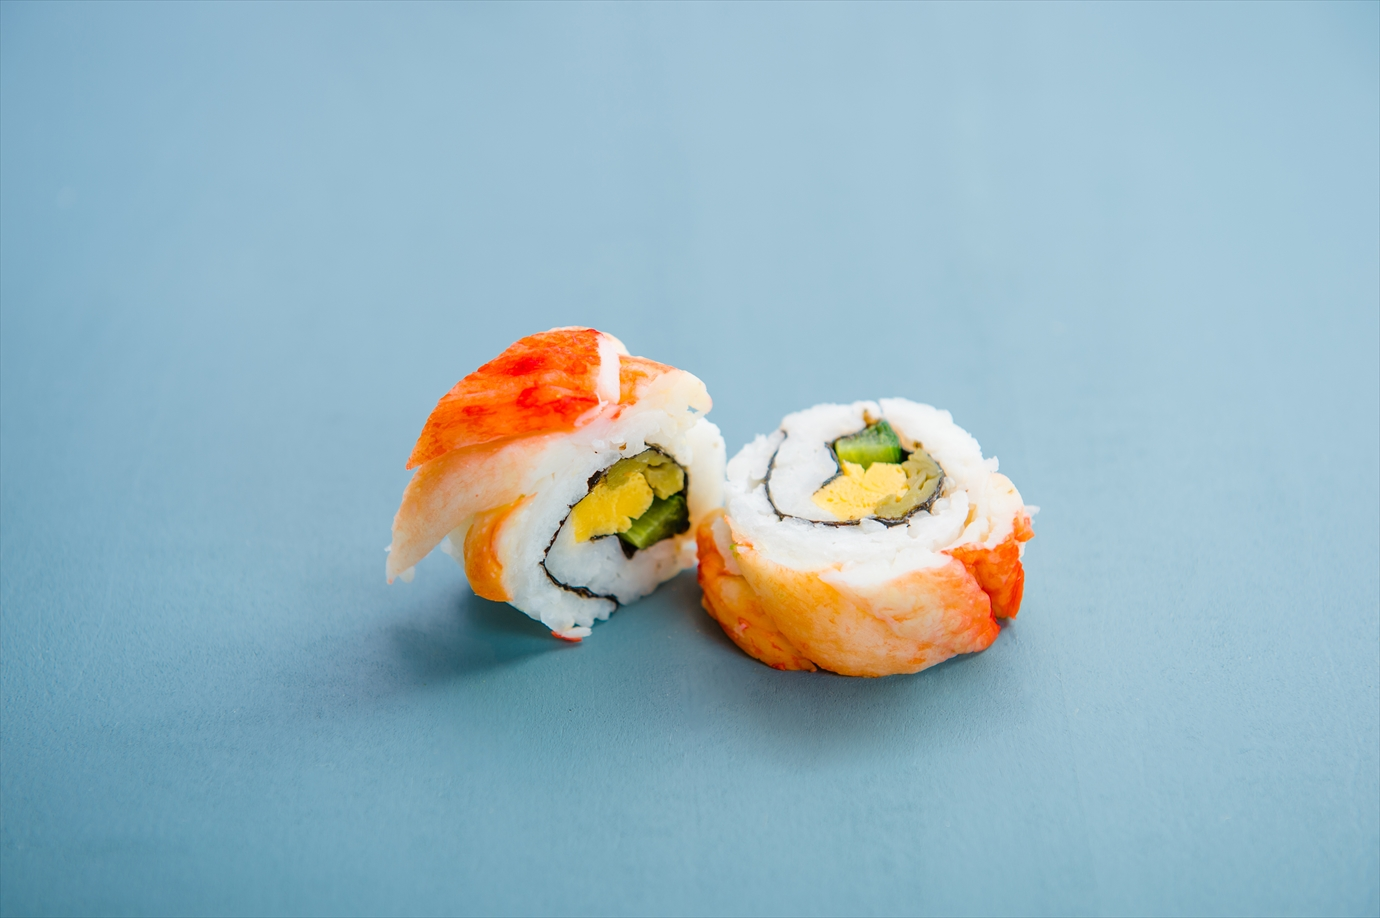 shari-the-tokyo-sushi-bar%e3%80%90%e3%83%ad%e3%83%bc%e3%83%ab%e5%af%bf%e5%8f%b8%e3%80%91%e3%82%bf%e3%83%a9%e3%83%8f%e3%82%99%e8%9f%b9%e3%83%ad%e3%83%bc%e3%83%ab